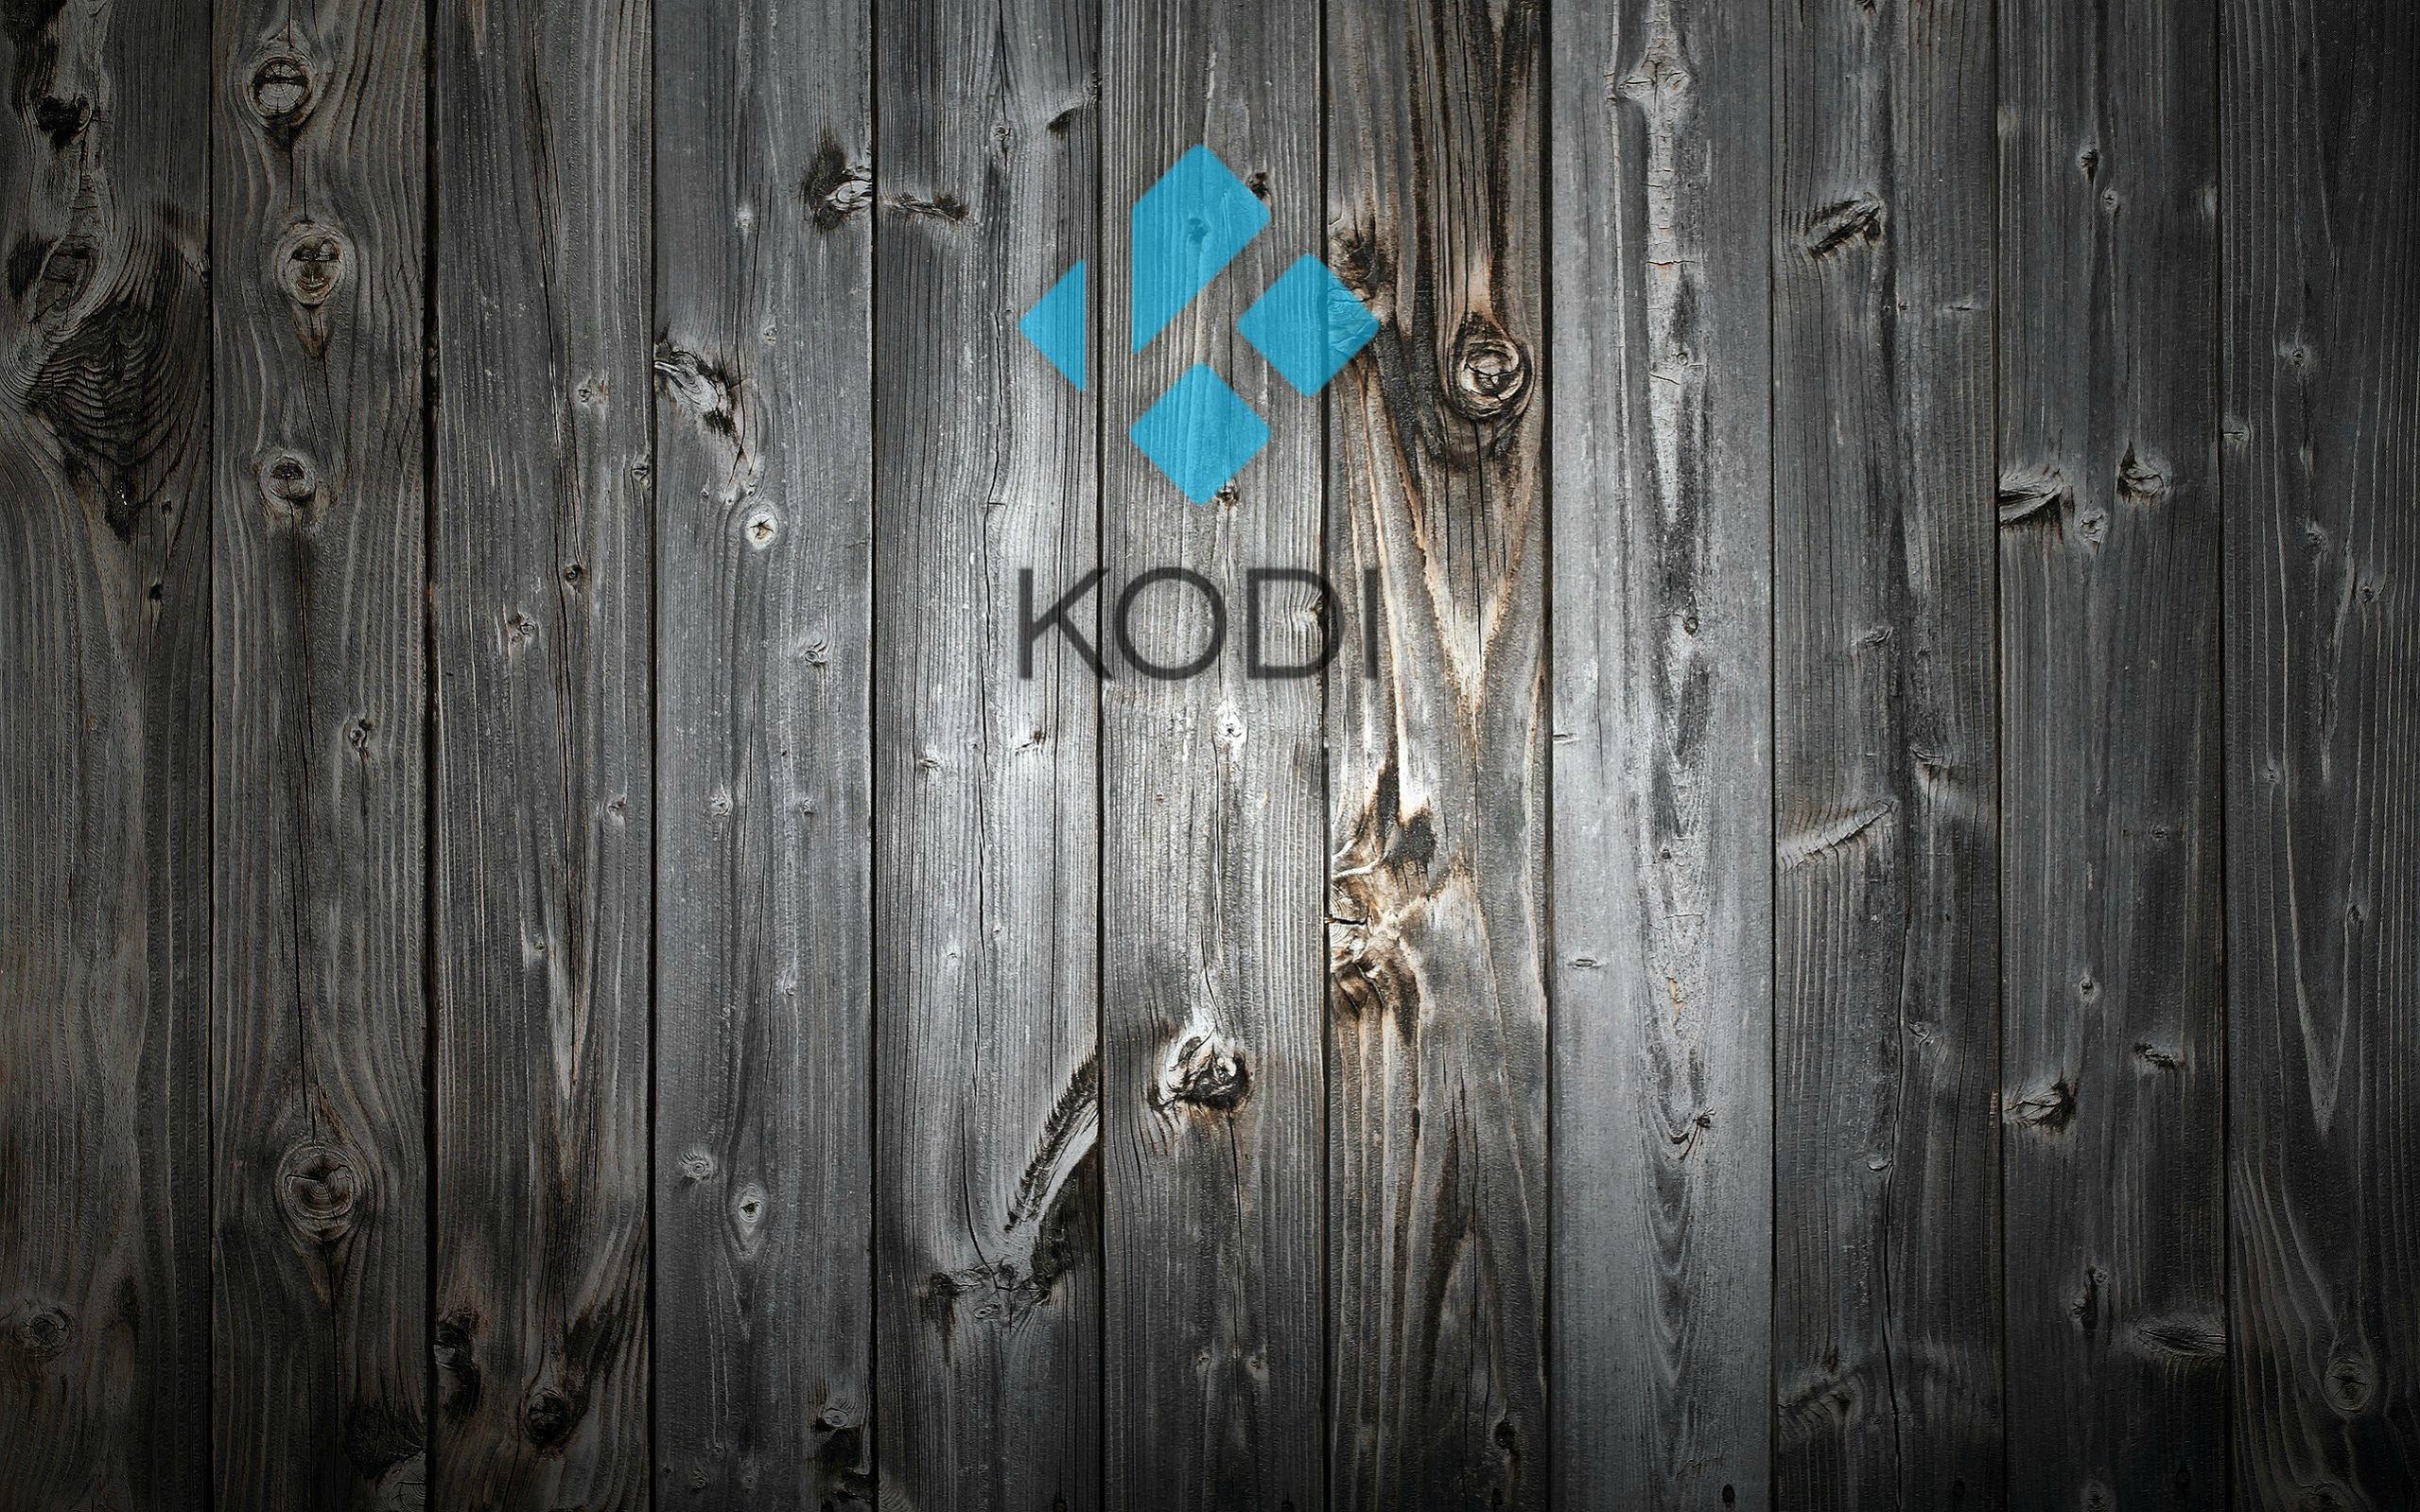 Kodi Wallpapers